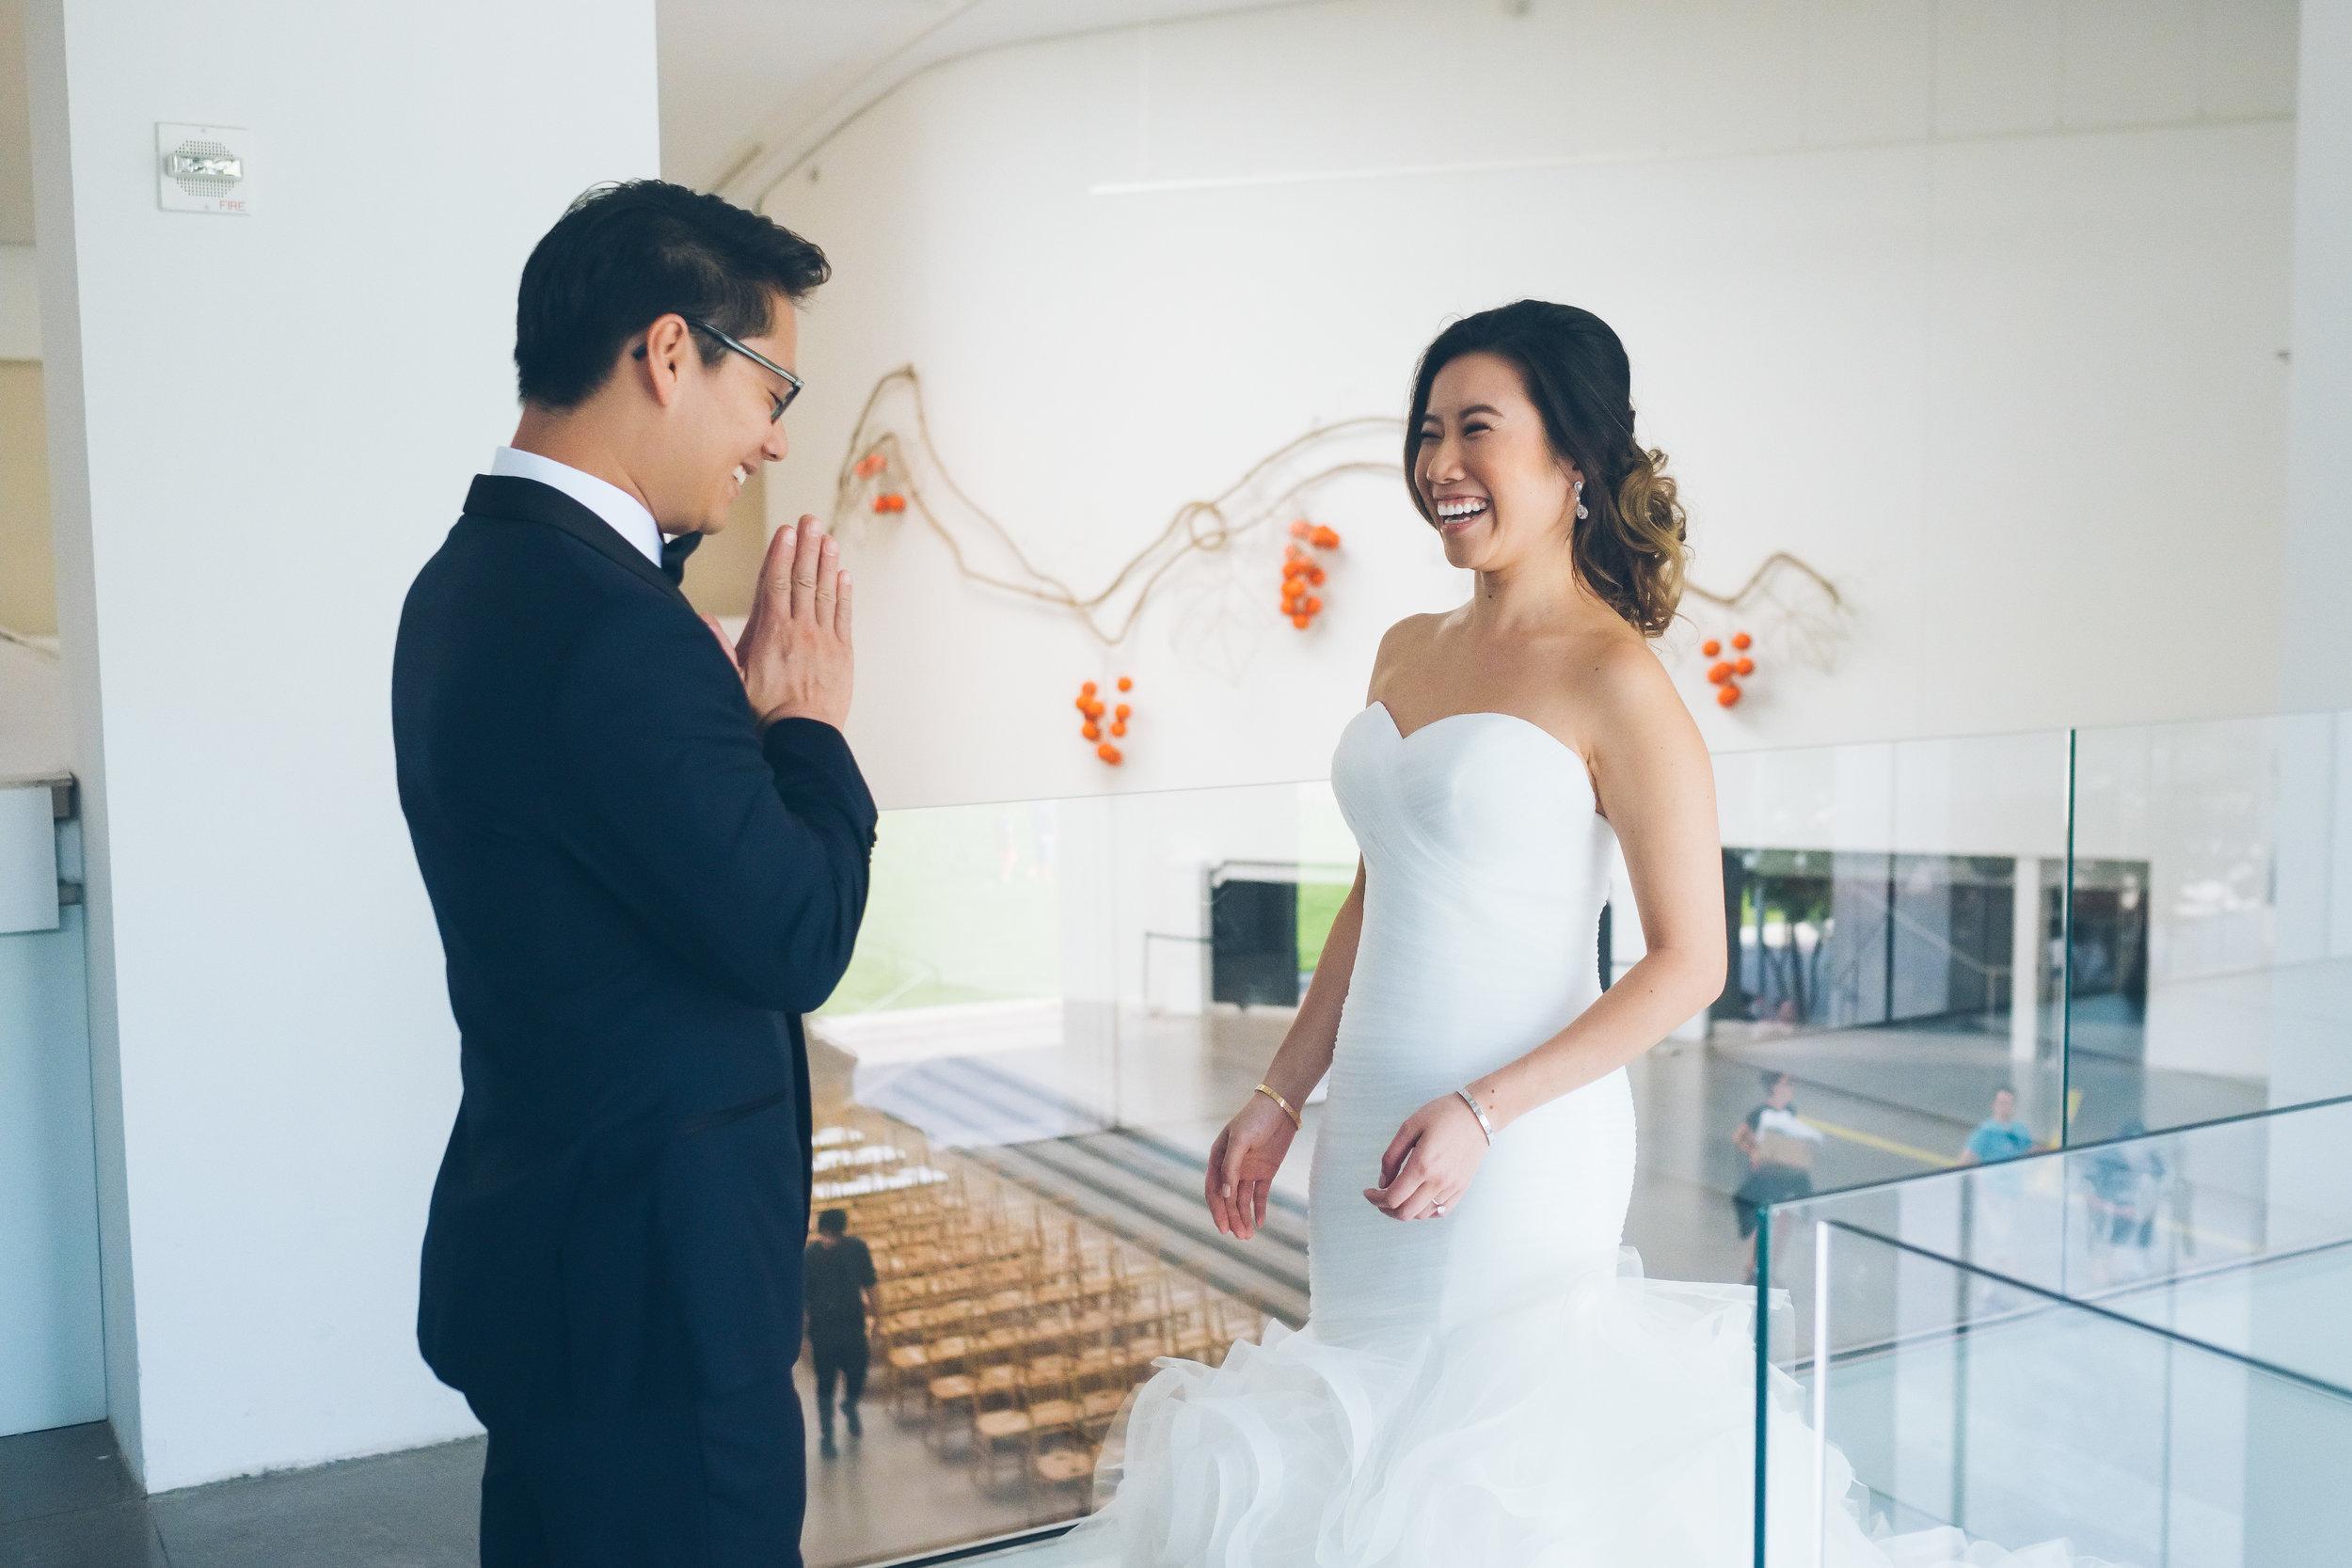 JUDITH-IRVING-NYC-WEDDING-FIRSTLOOK-CYNTHIACHUNG-0040.jpg